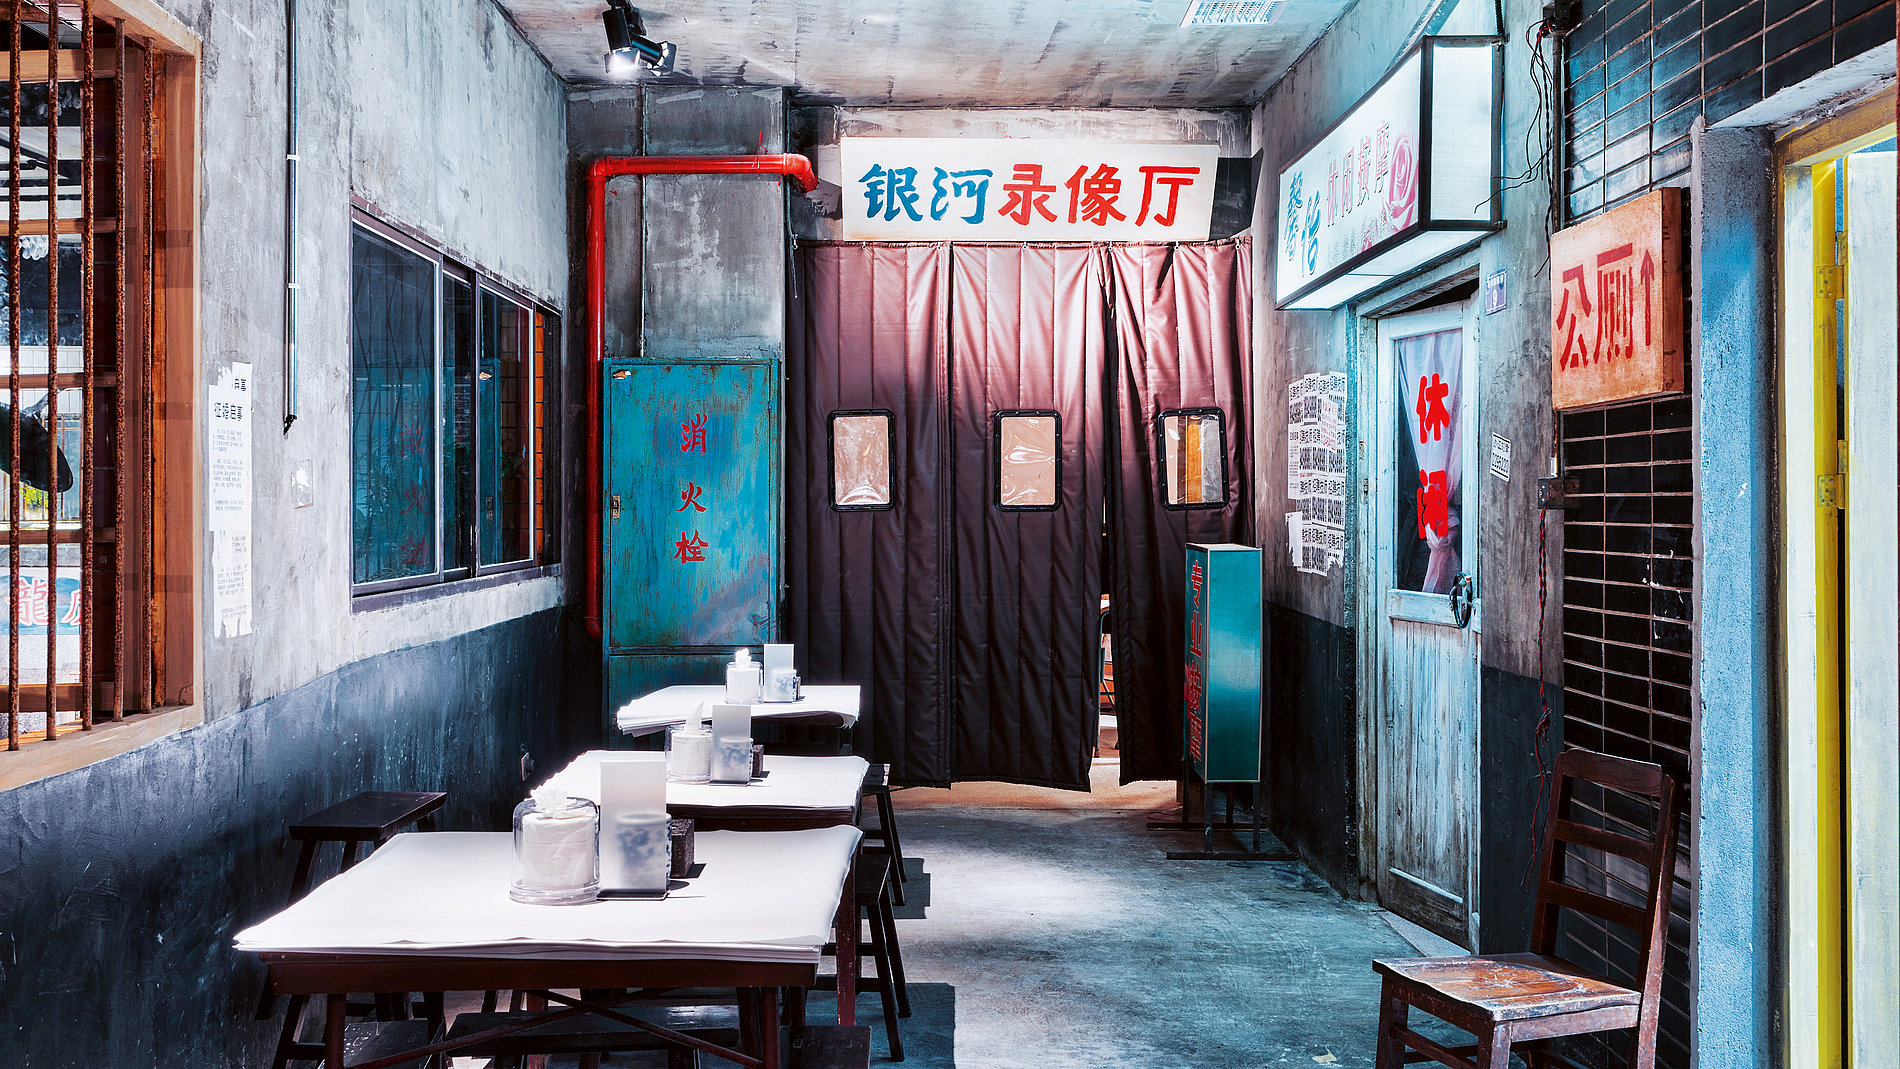 Wenheyou Laochangsha Lobster Restaurant | Red Dot Design Award